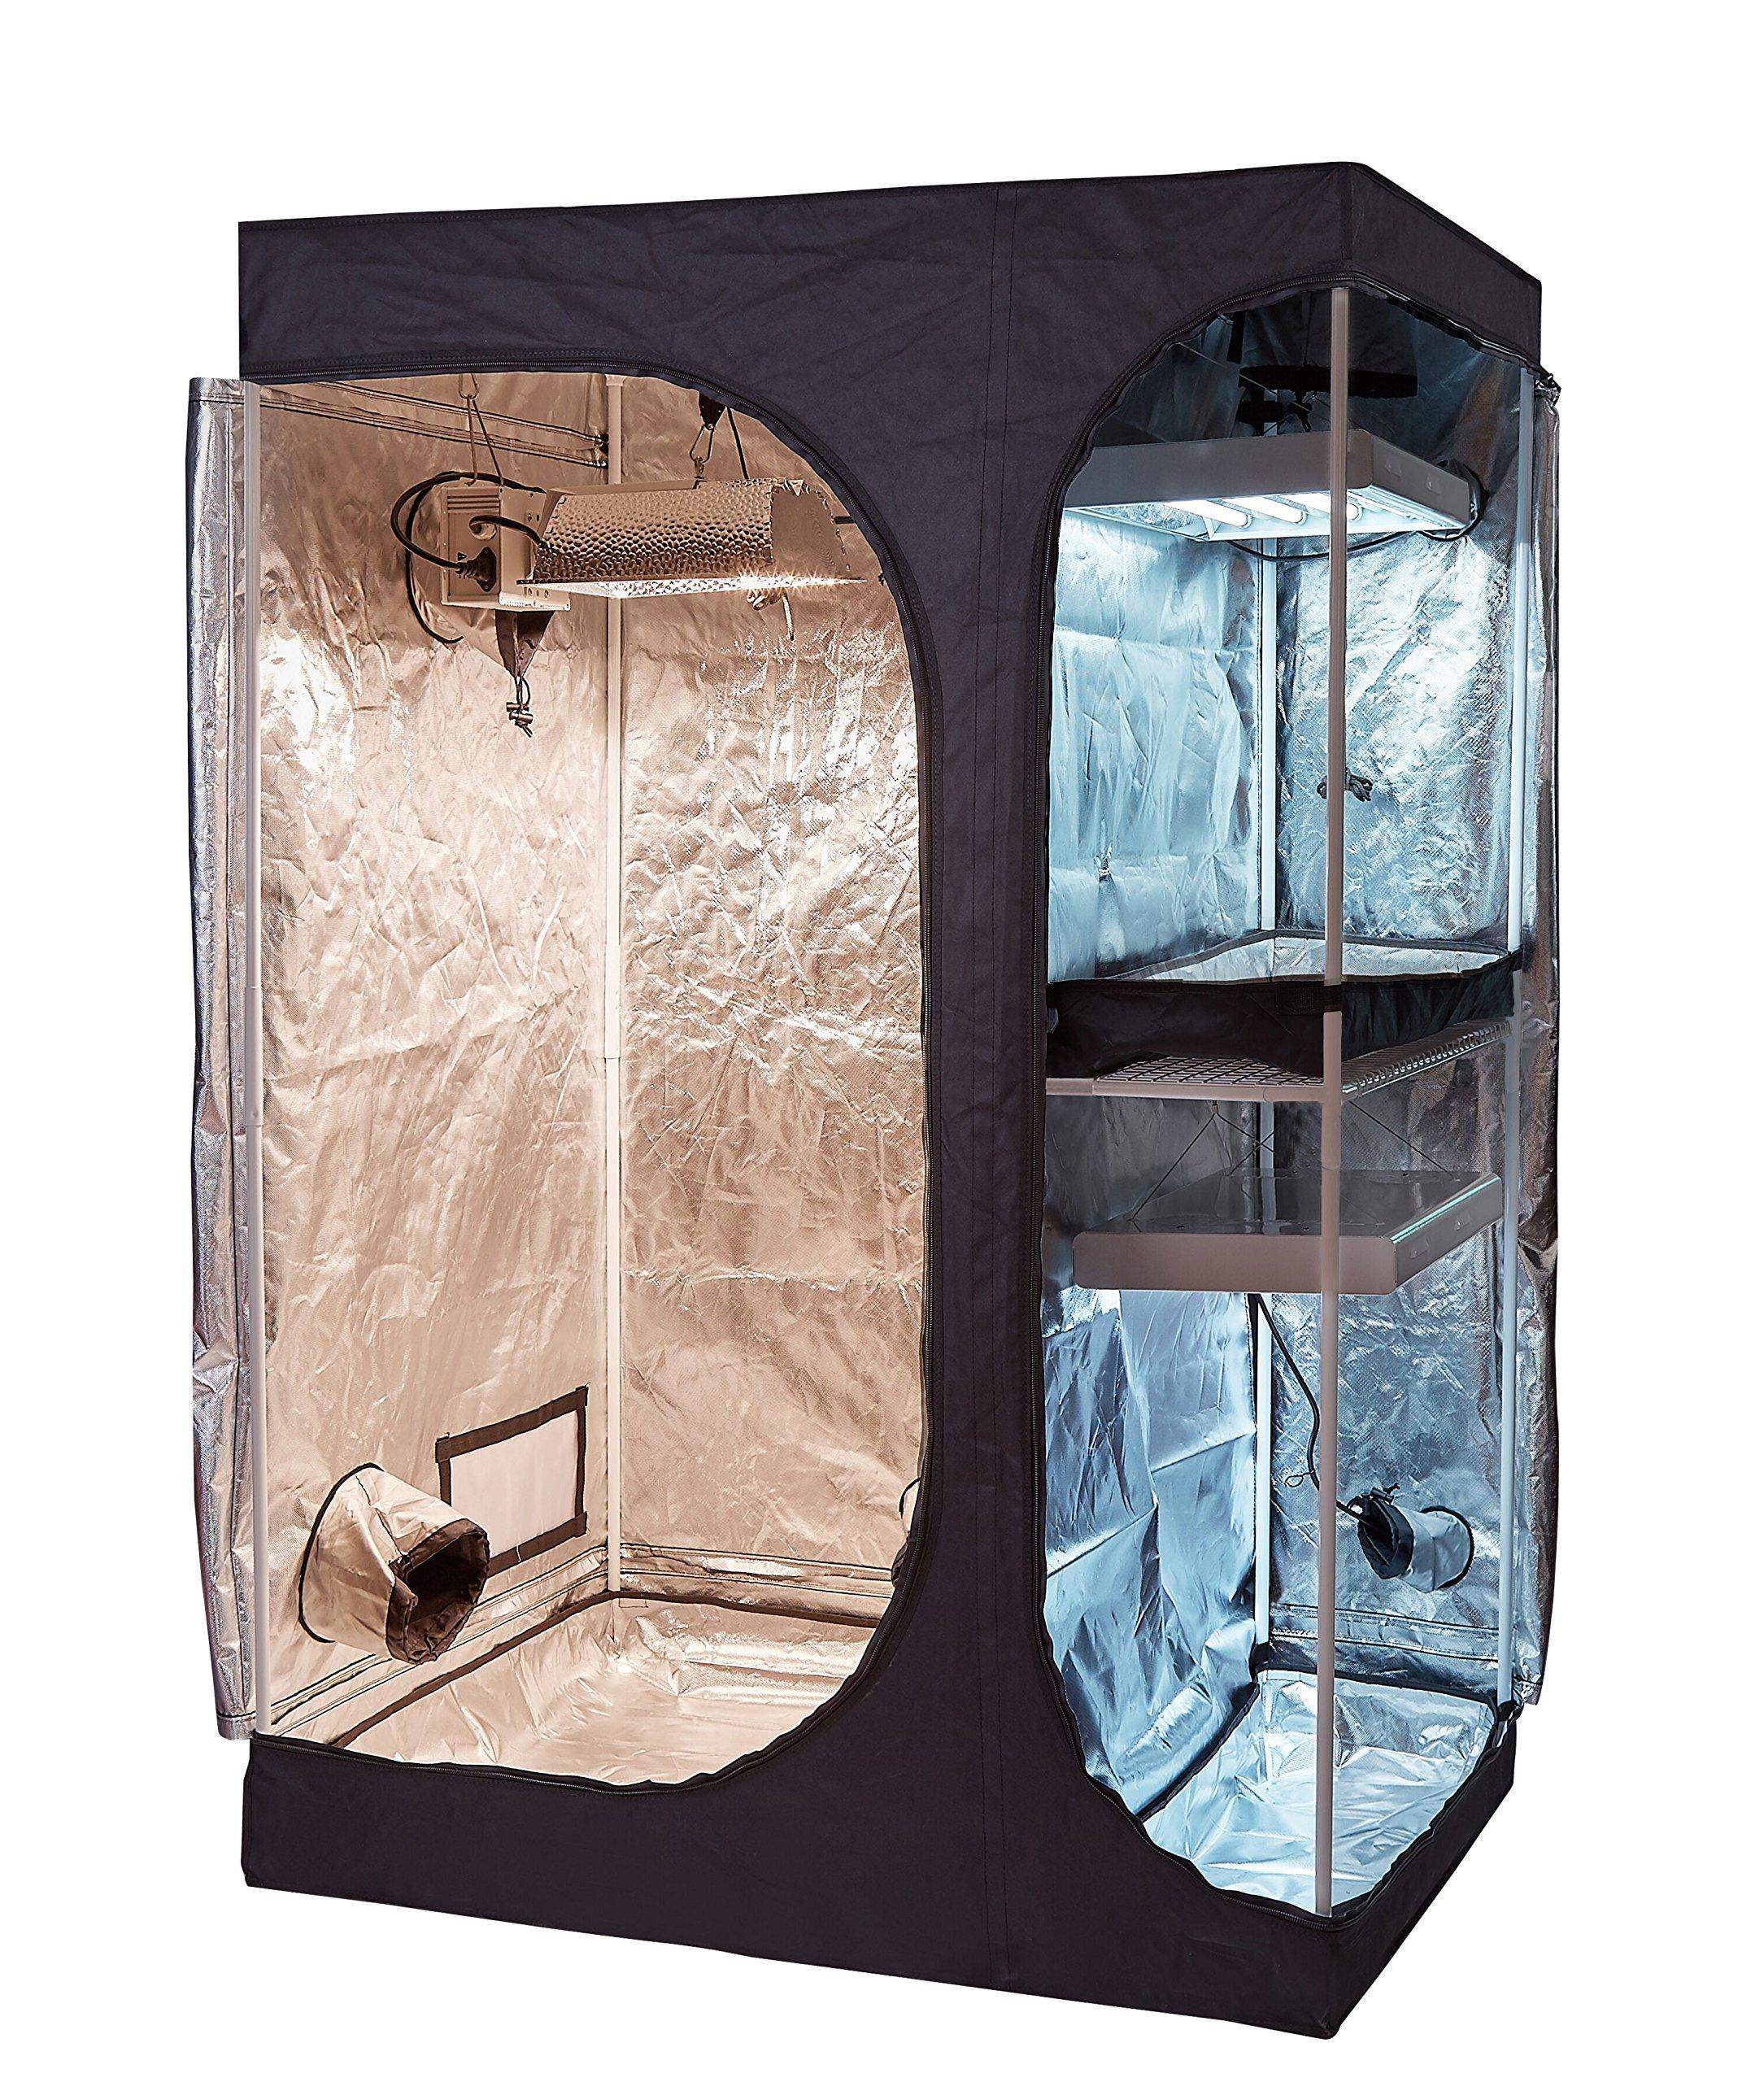 Hongruilite 36''x24''x53'' 48''x36''x72'' 2-in-1 Hydroponic Indoor Grow Tent Room Propagation High Reflective 600D Diamond Mylar Growing Plant w/Metal Corner (48''X36''X72''(2-in-1) Lodge Propagation Tent) by Hongruilite